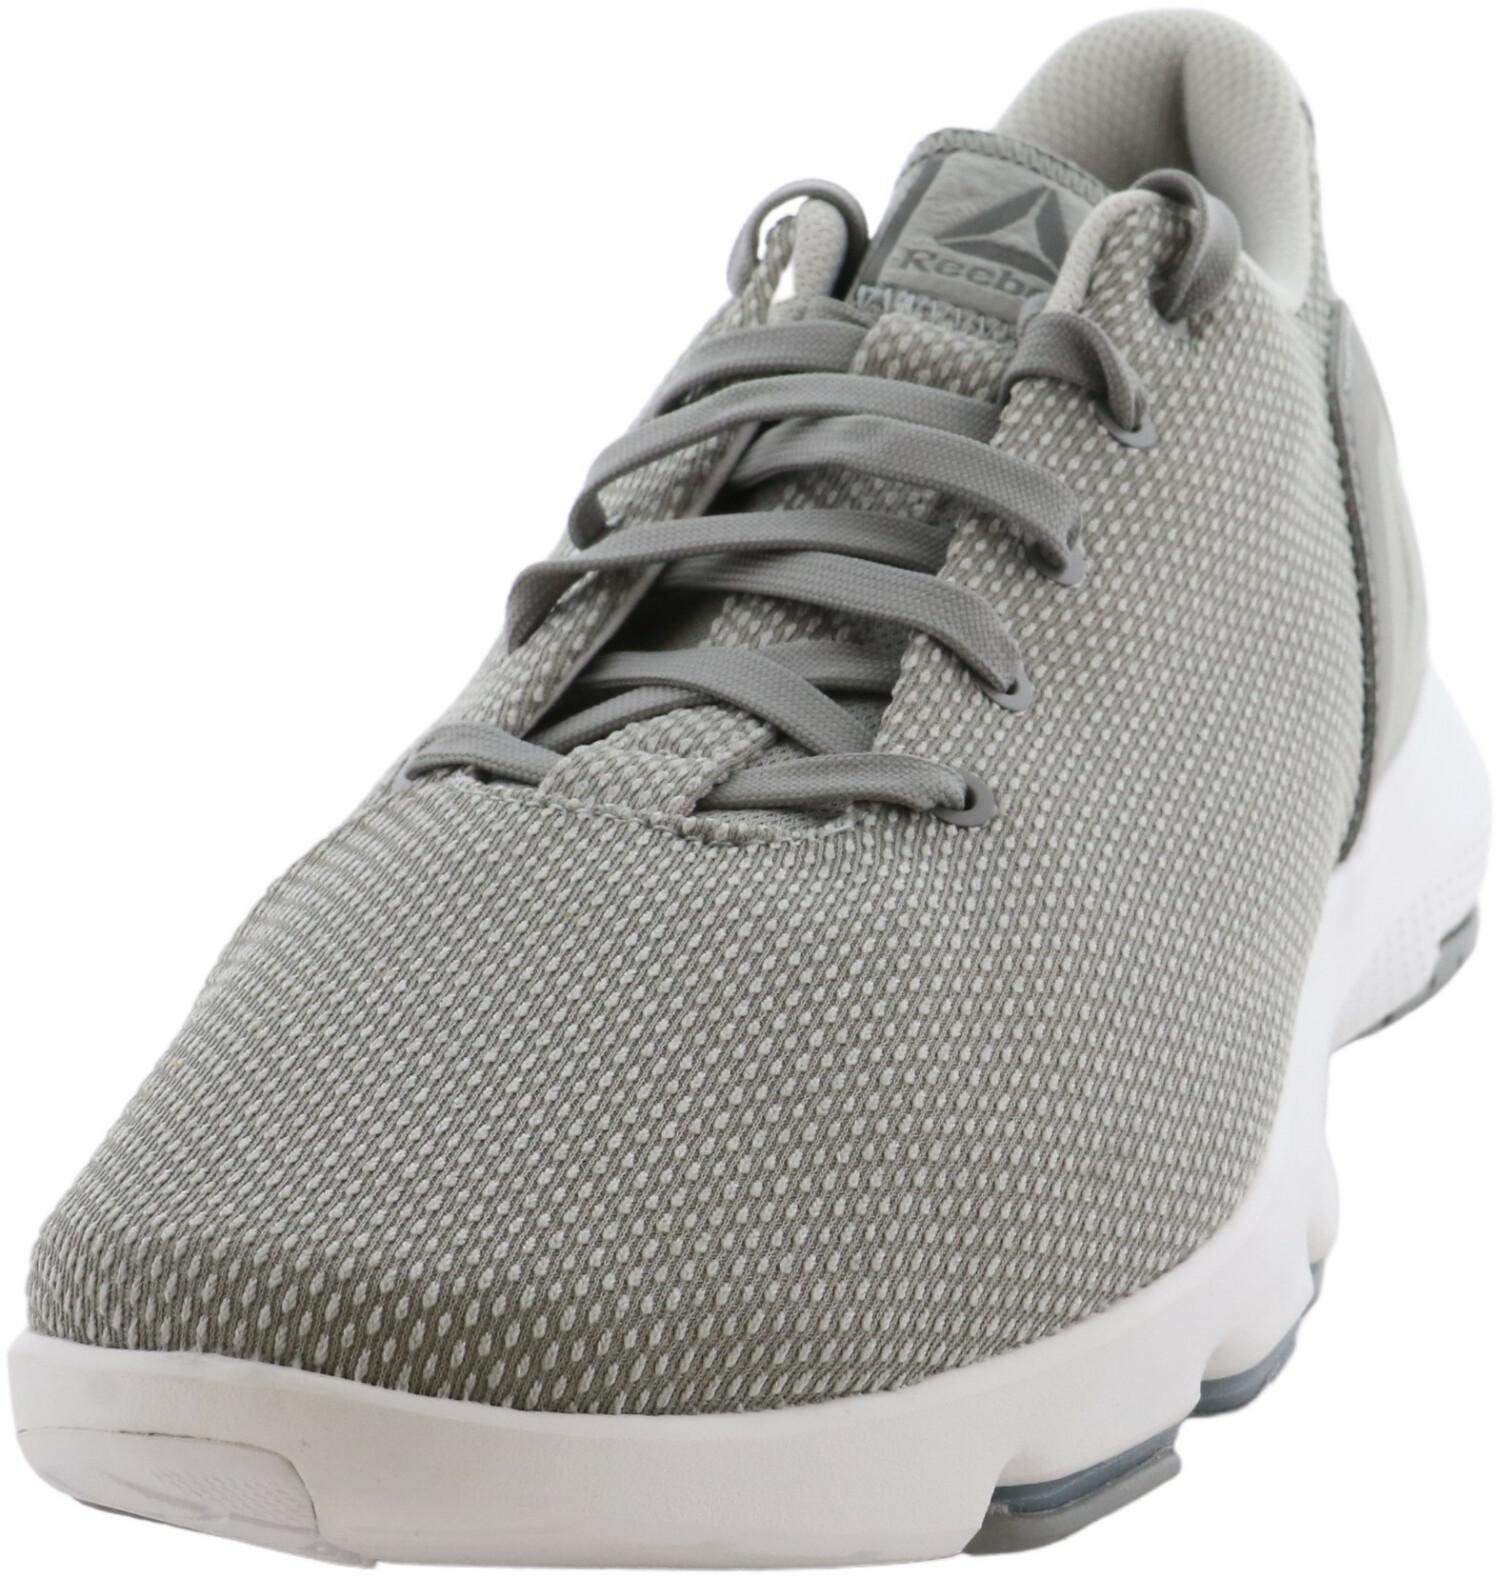 Reebok Men's Cloudride Dmx 3.0 Grey / White Ankle-High Walking - 9M